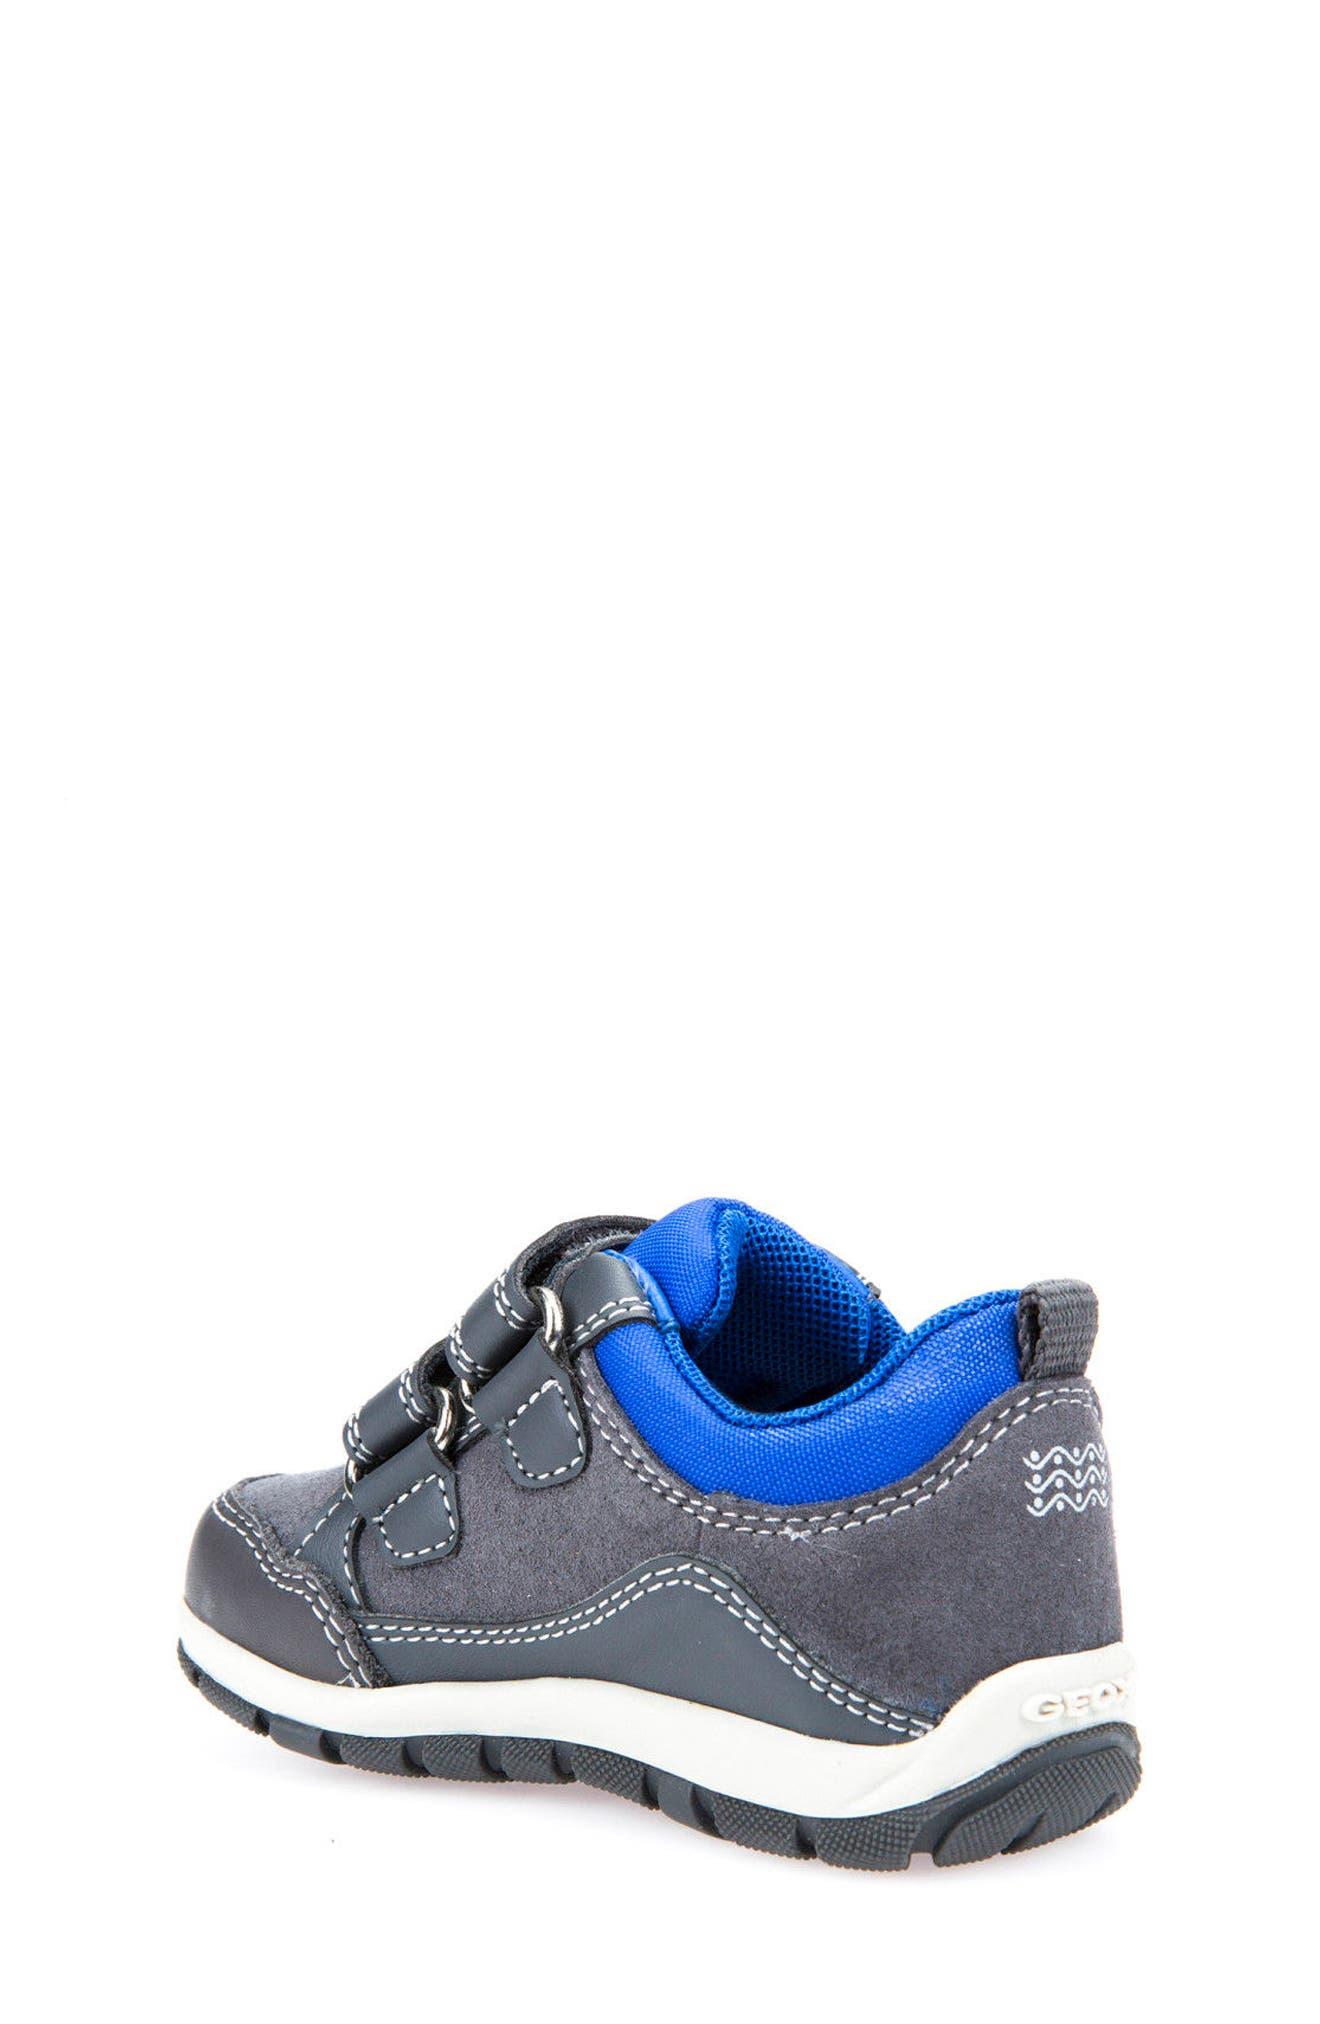 'Shaax 9' Sneaker,                             Alternate thumbnail 3, color,                             Grey/ Royal